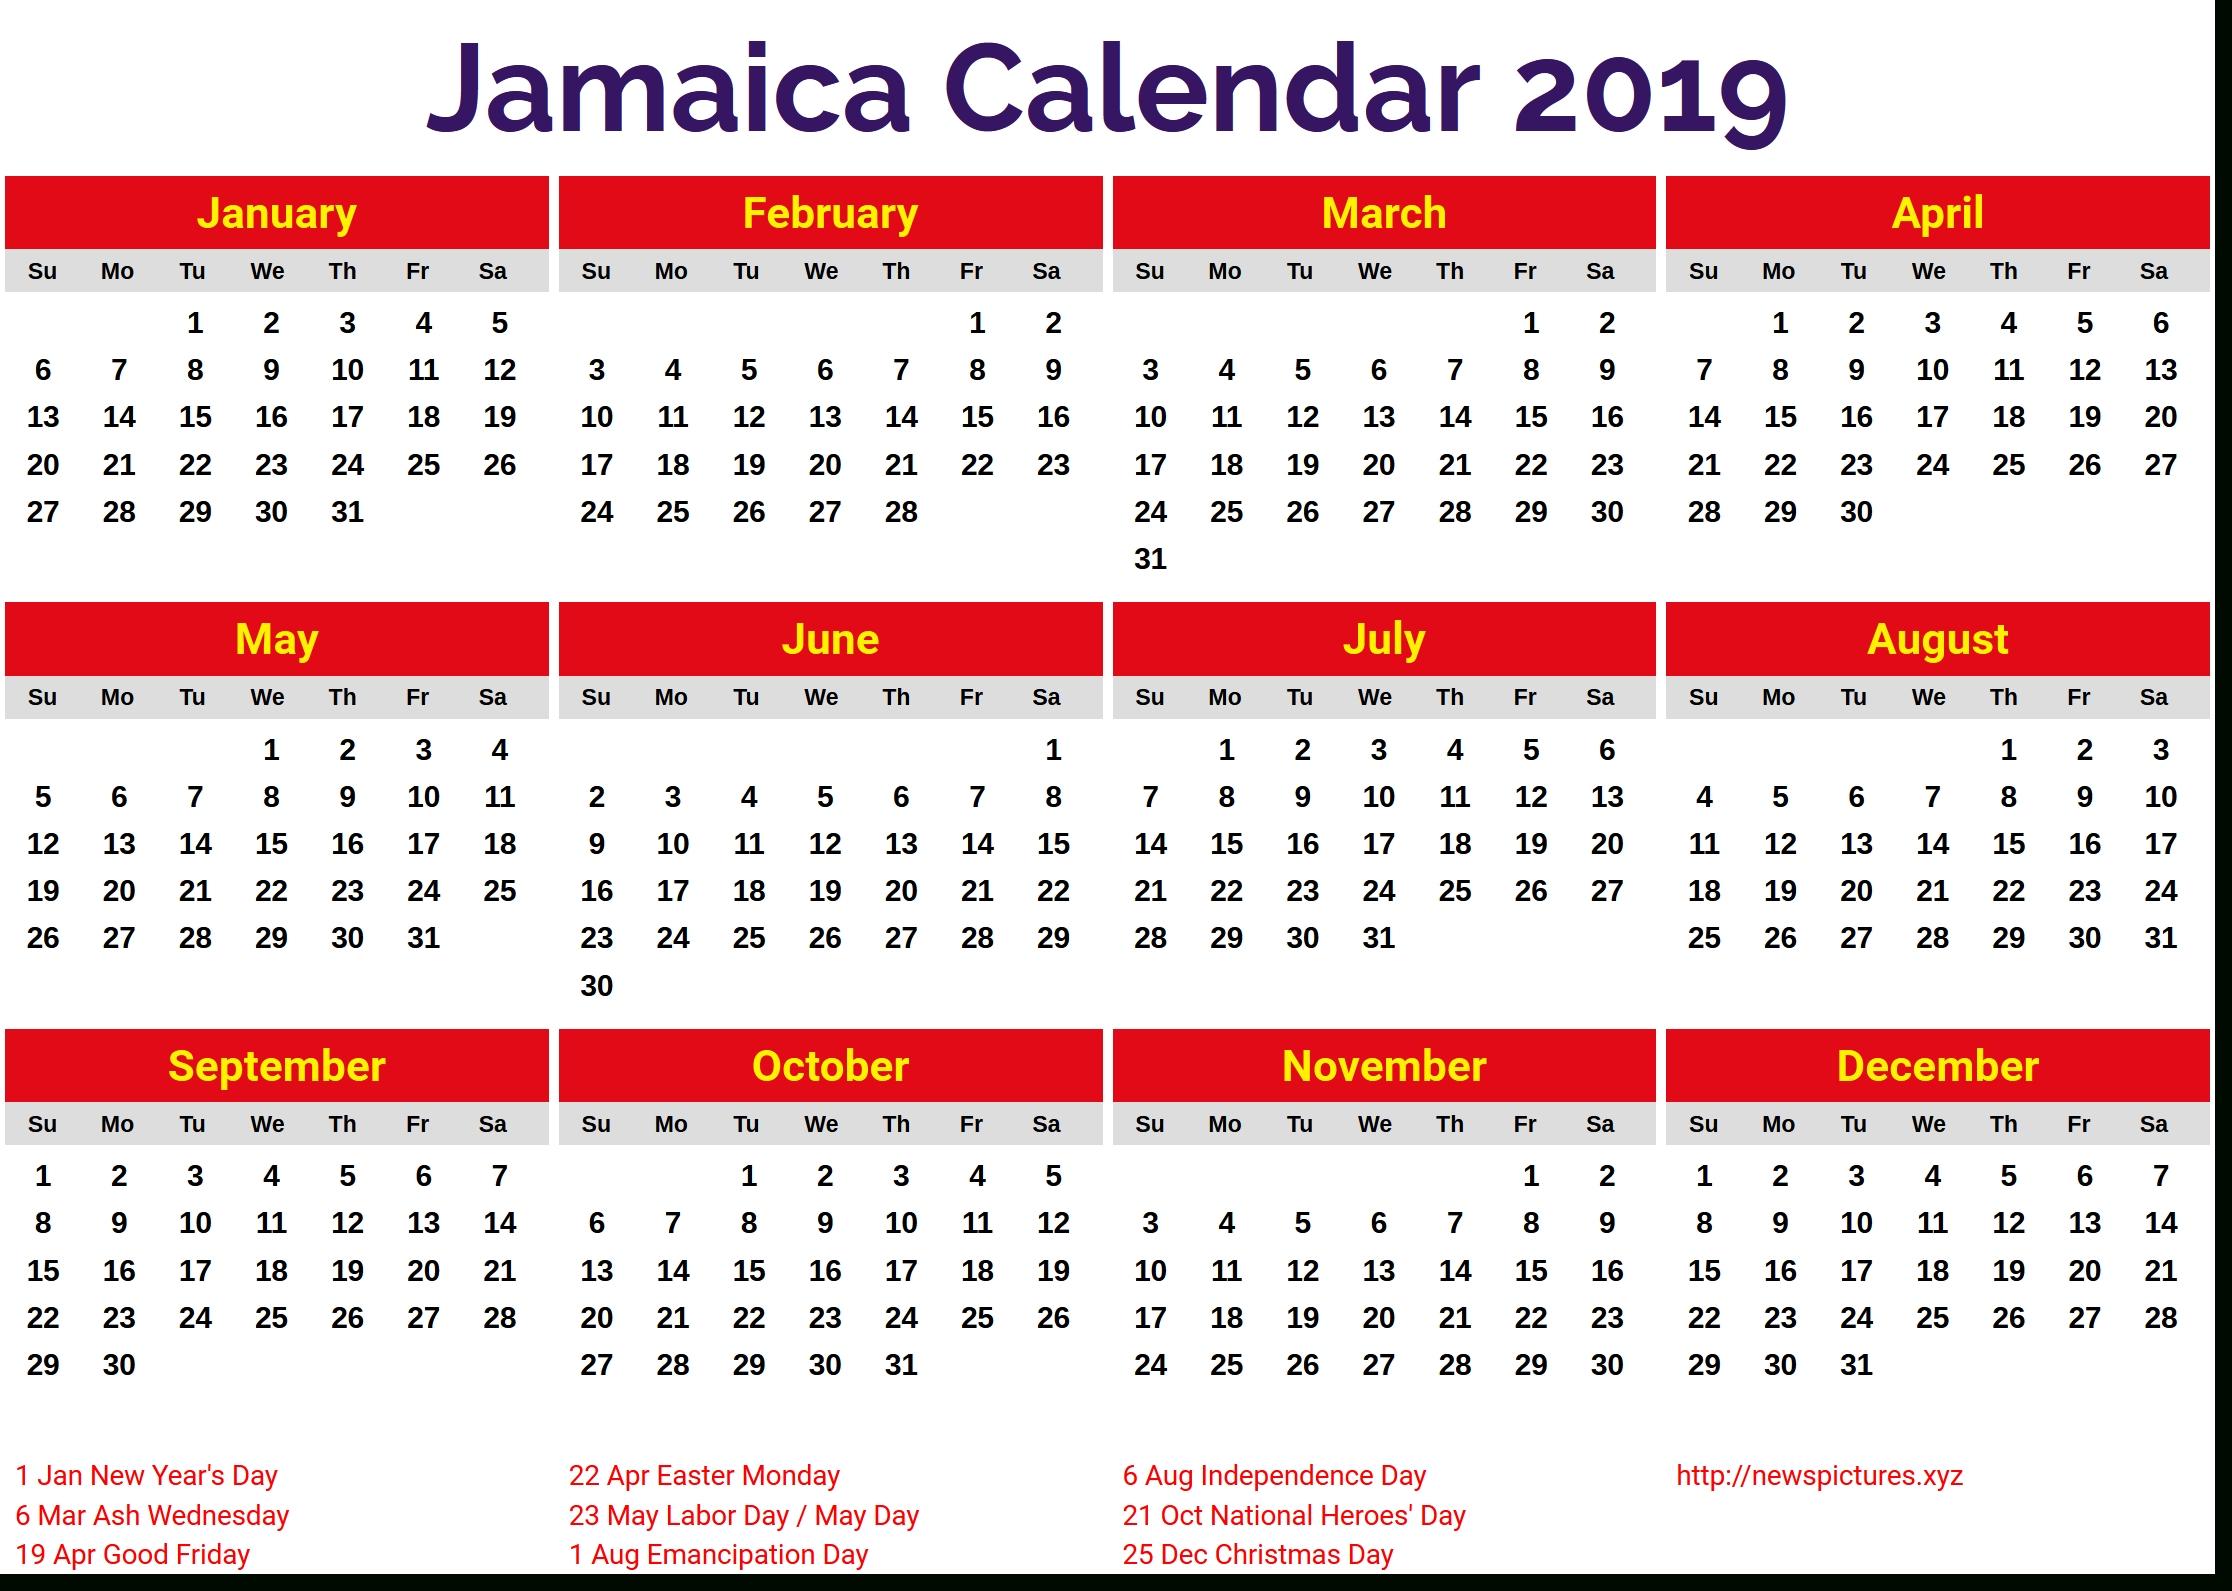 Image For Jamaica 2019 Calendar | Pink Wedding | Holiday-Jamaica Public Holidays 2020 Printable